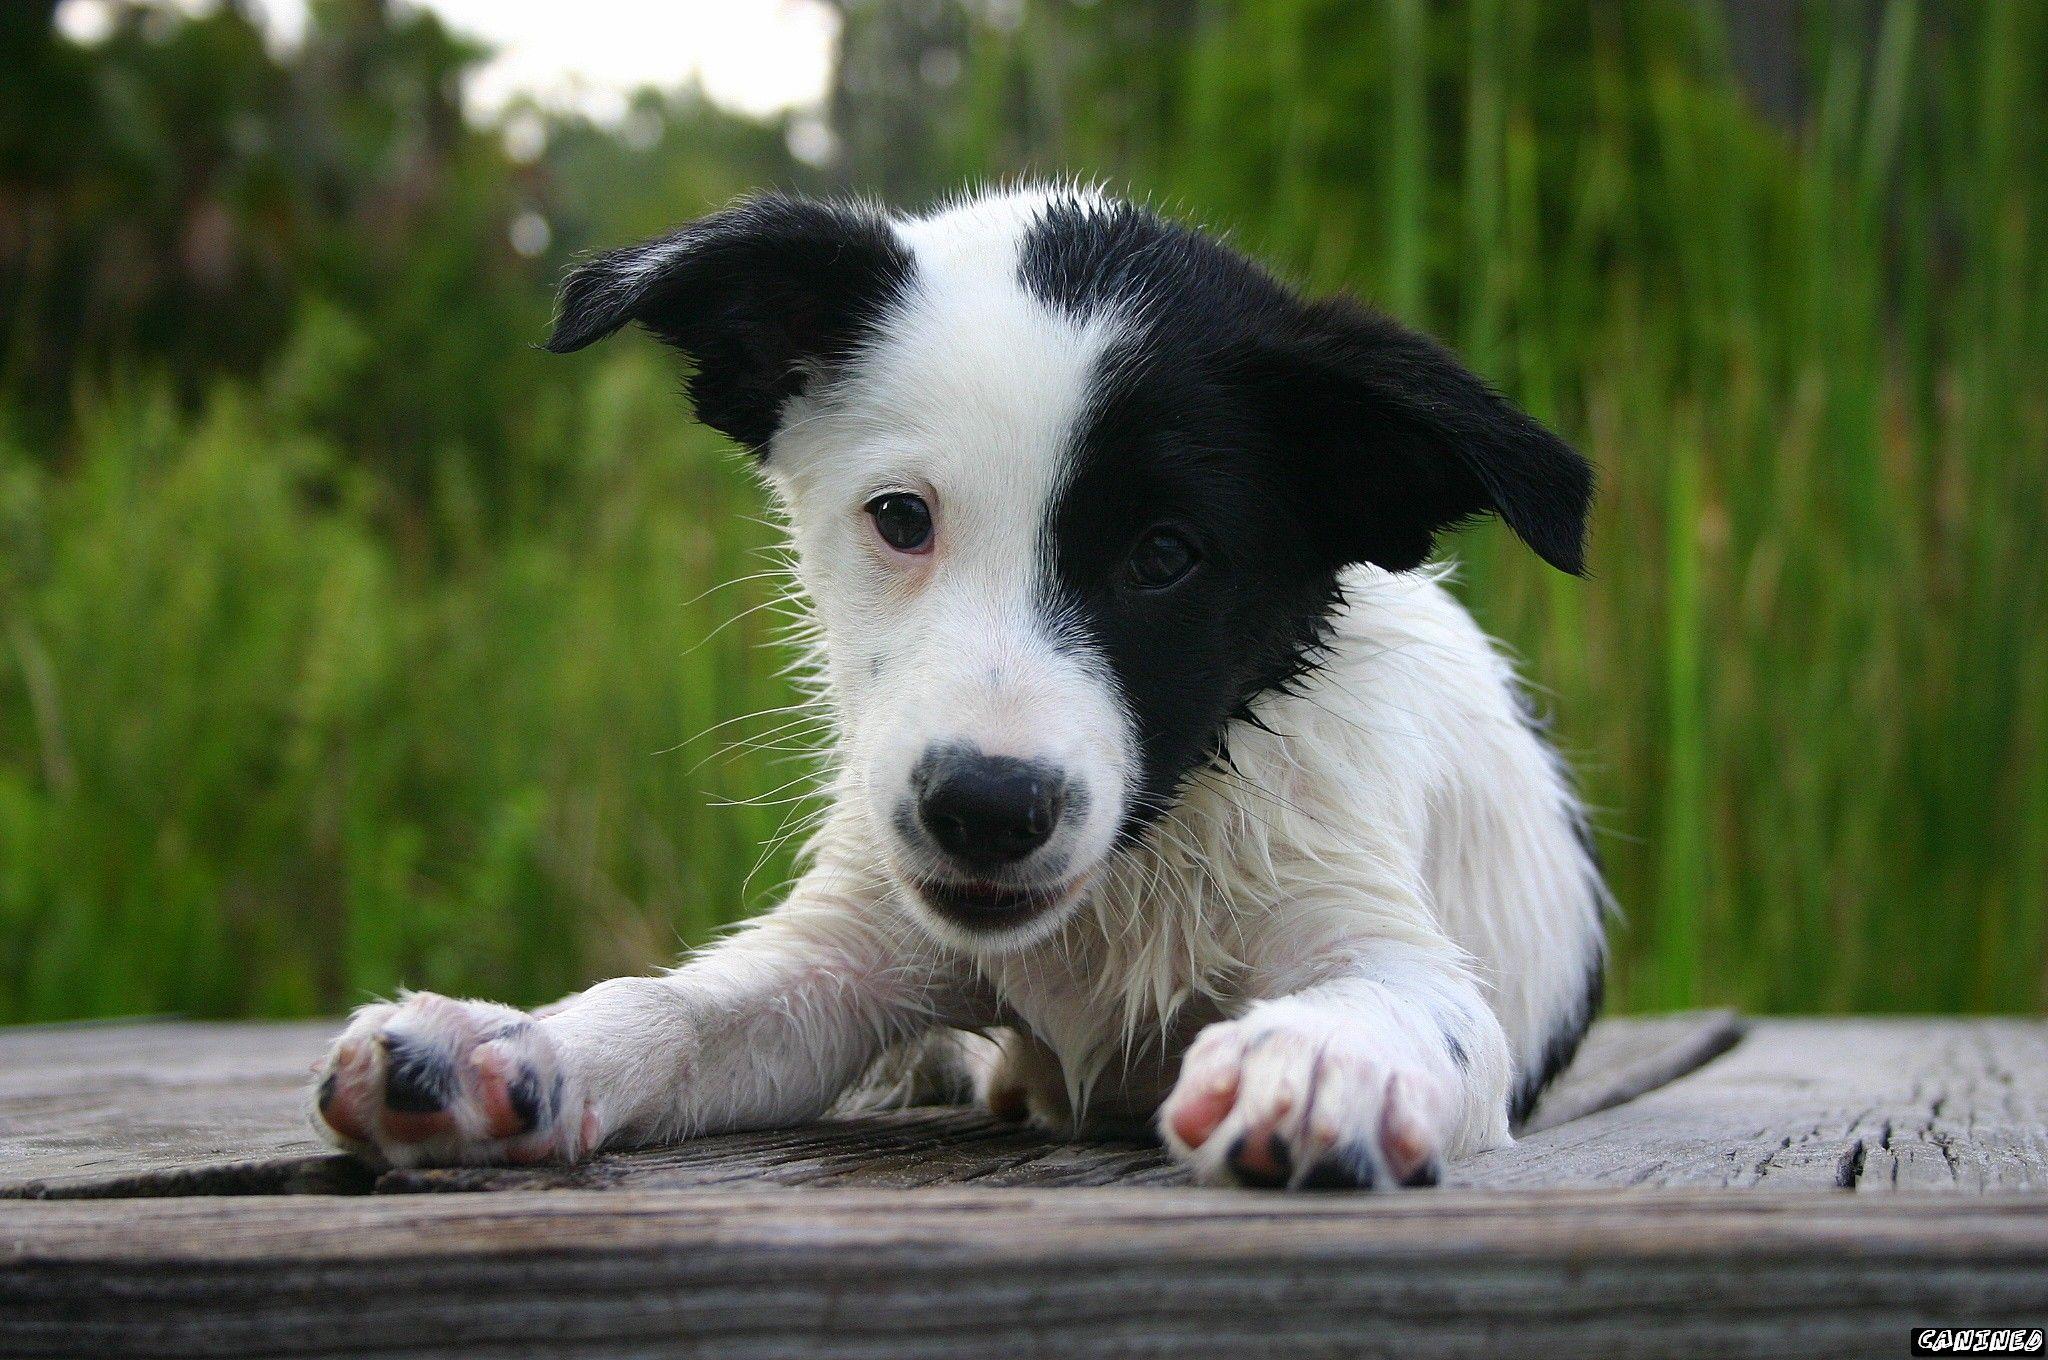 collie australian shepherd mix breed mutt puppy dog